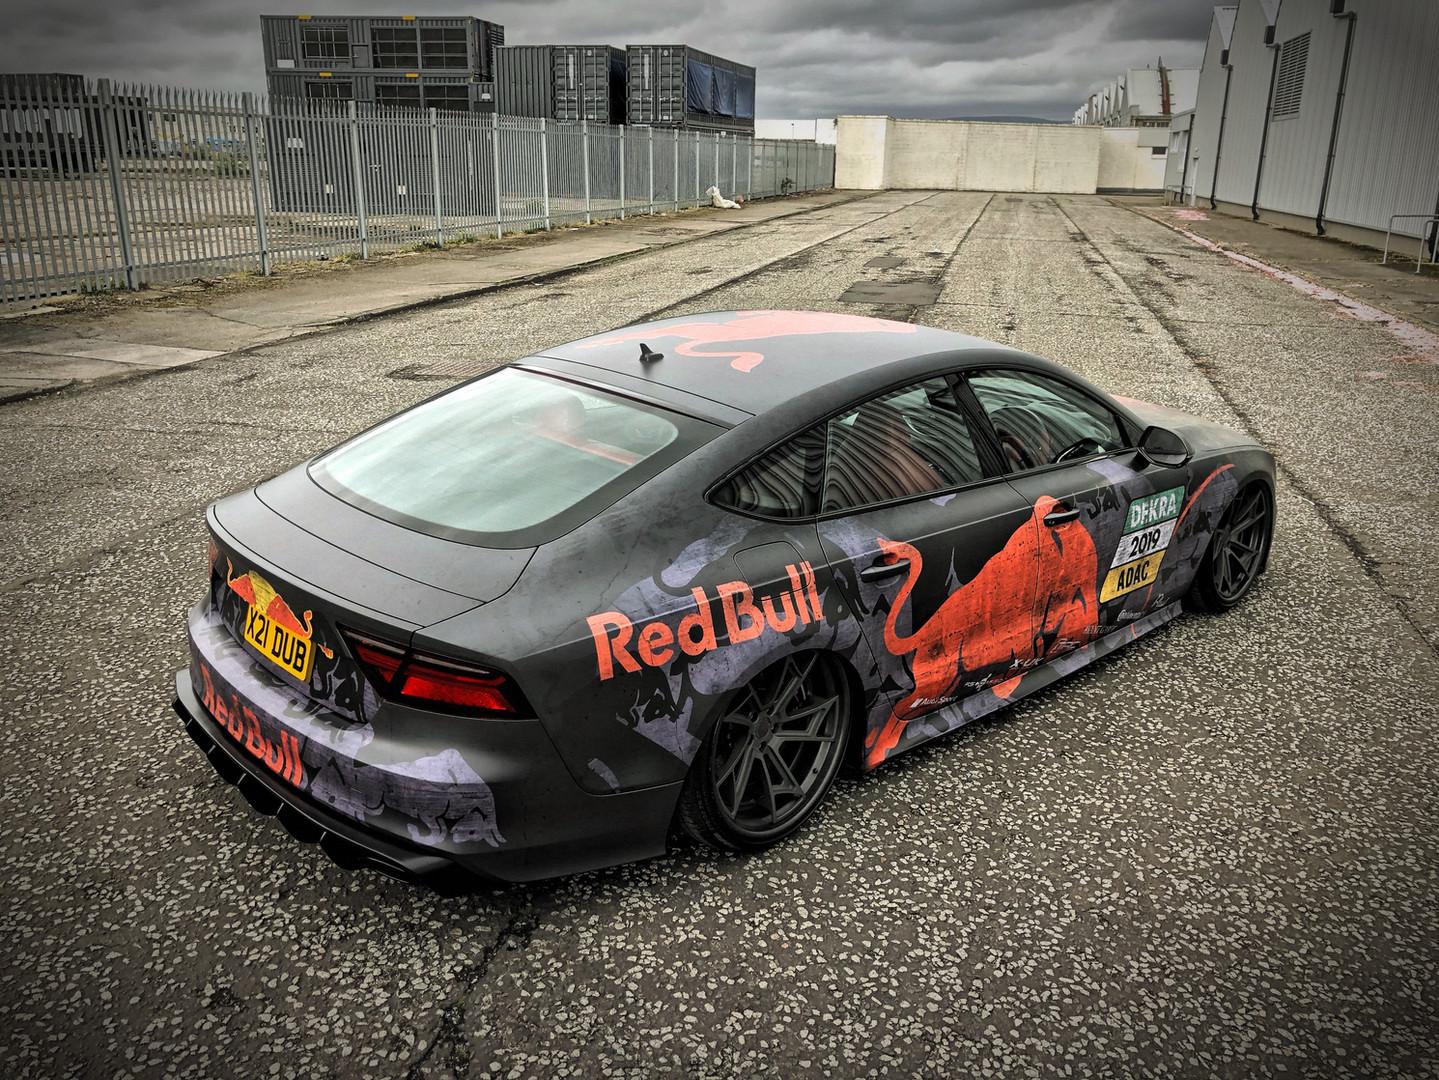 Audi A7 Red Bull Wrap.jpg